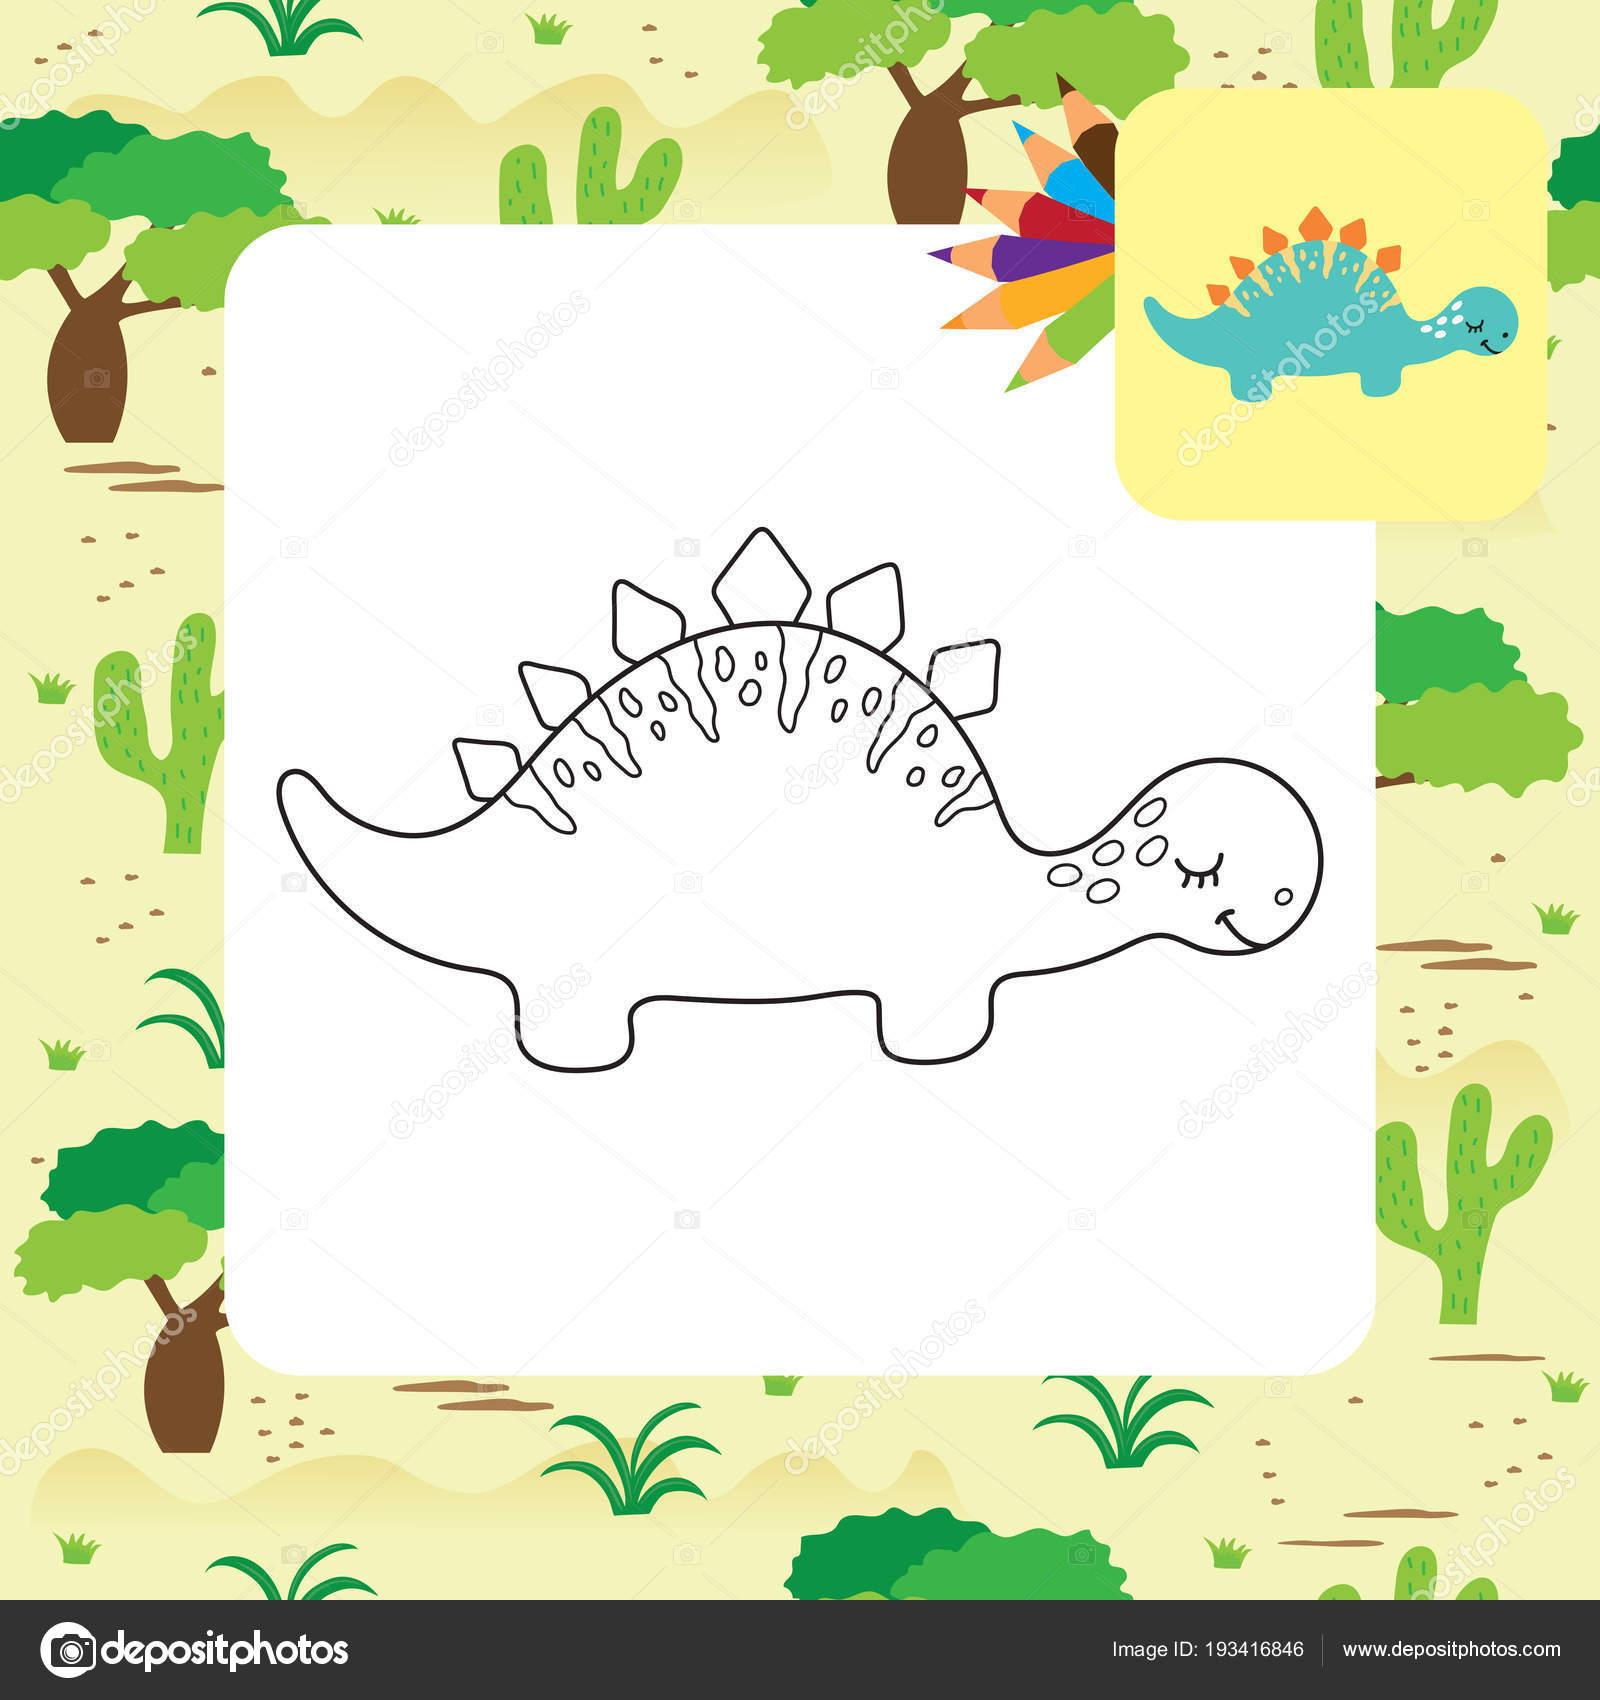 Niedlichen Cartoon Dino Malvorlagen — Stockvektor © ARNICA83 #193416846